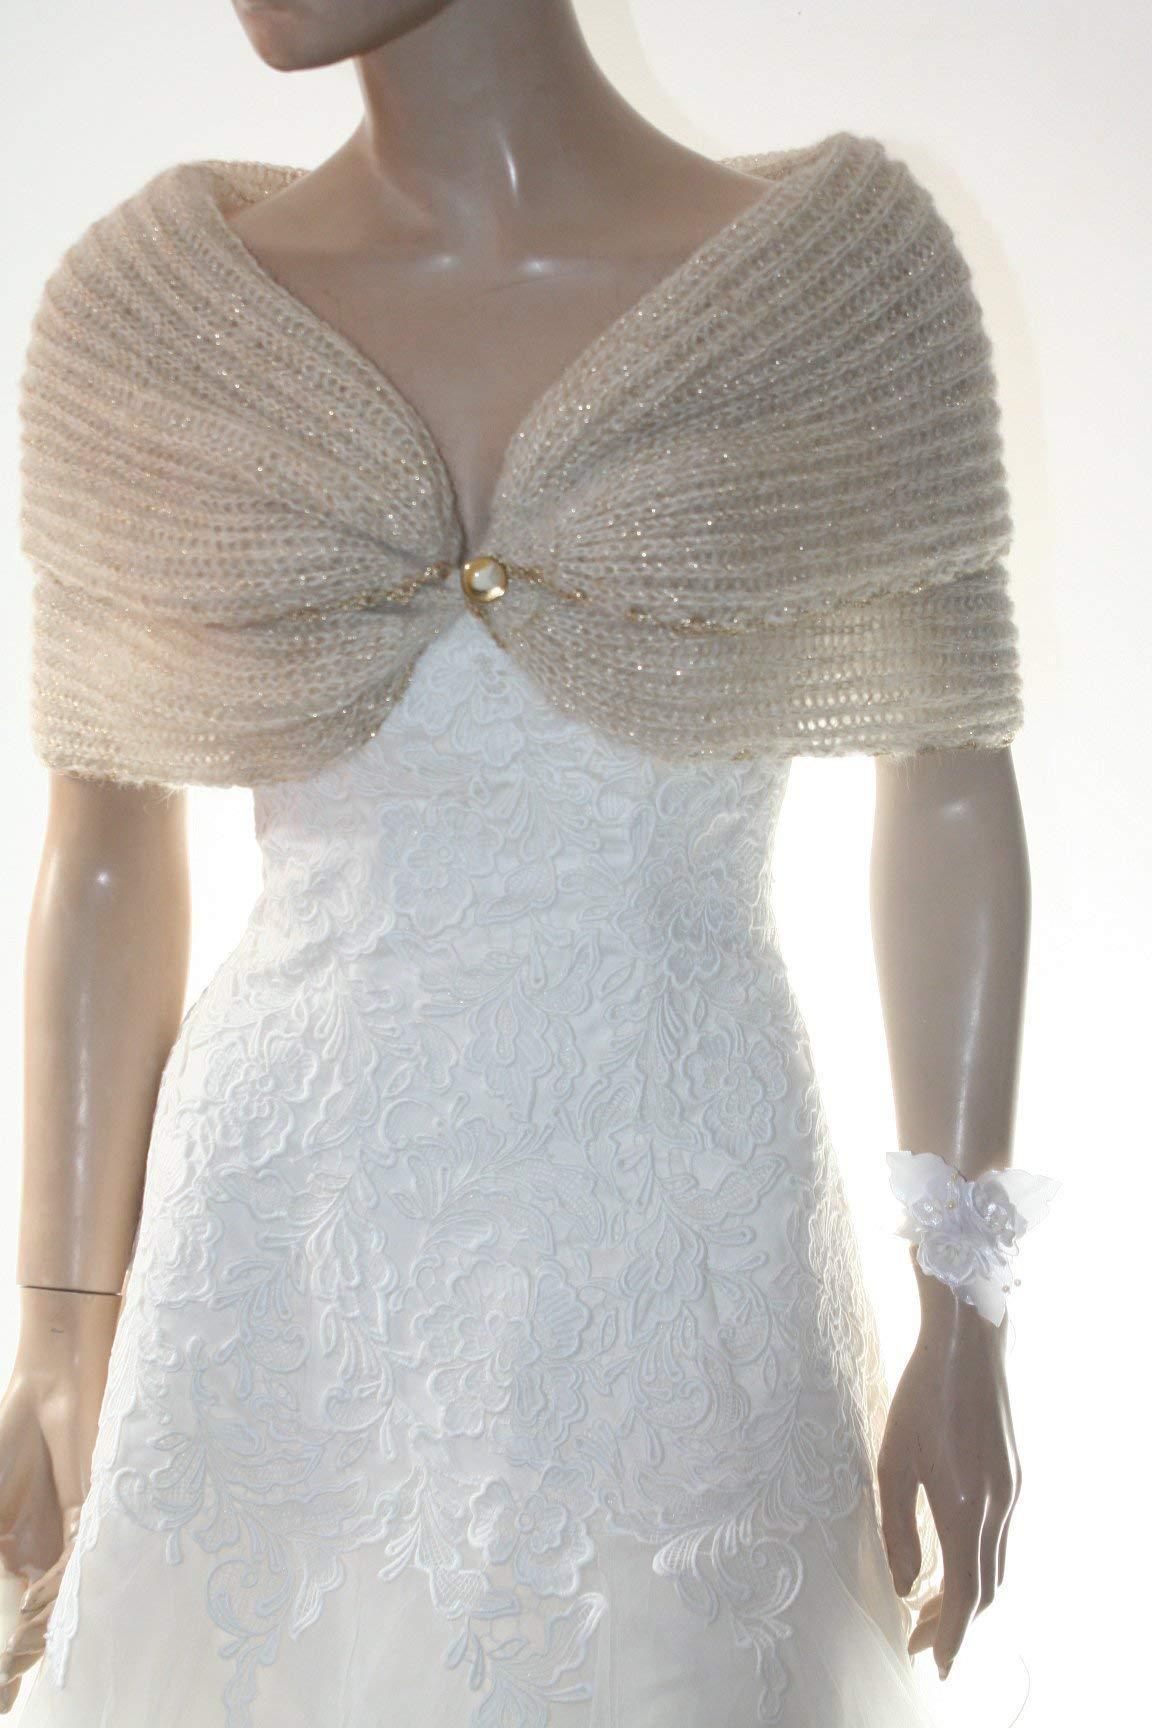 Ivory Gold Shrug Evening Mohair Jacket Knitted Shawl Wedding Bolero Jacket,Gold Knitted Cape Winter Wedding Wrap Bridesmaid Cover Up